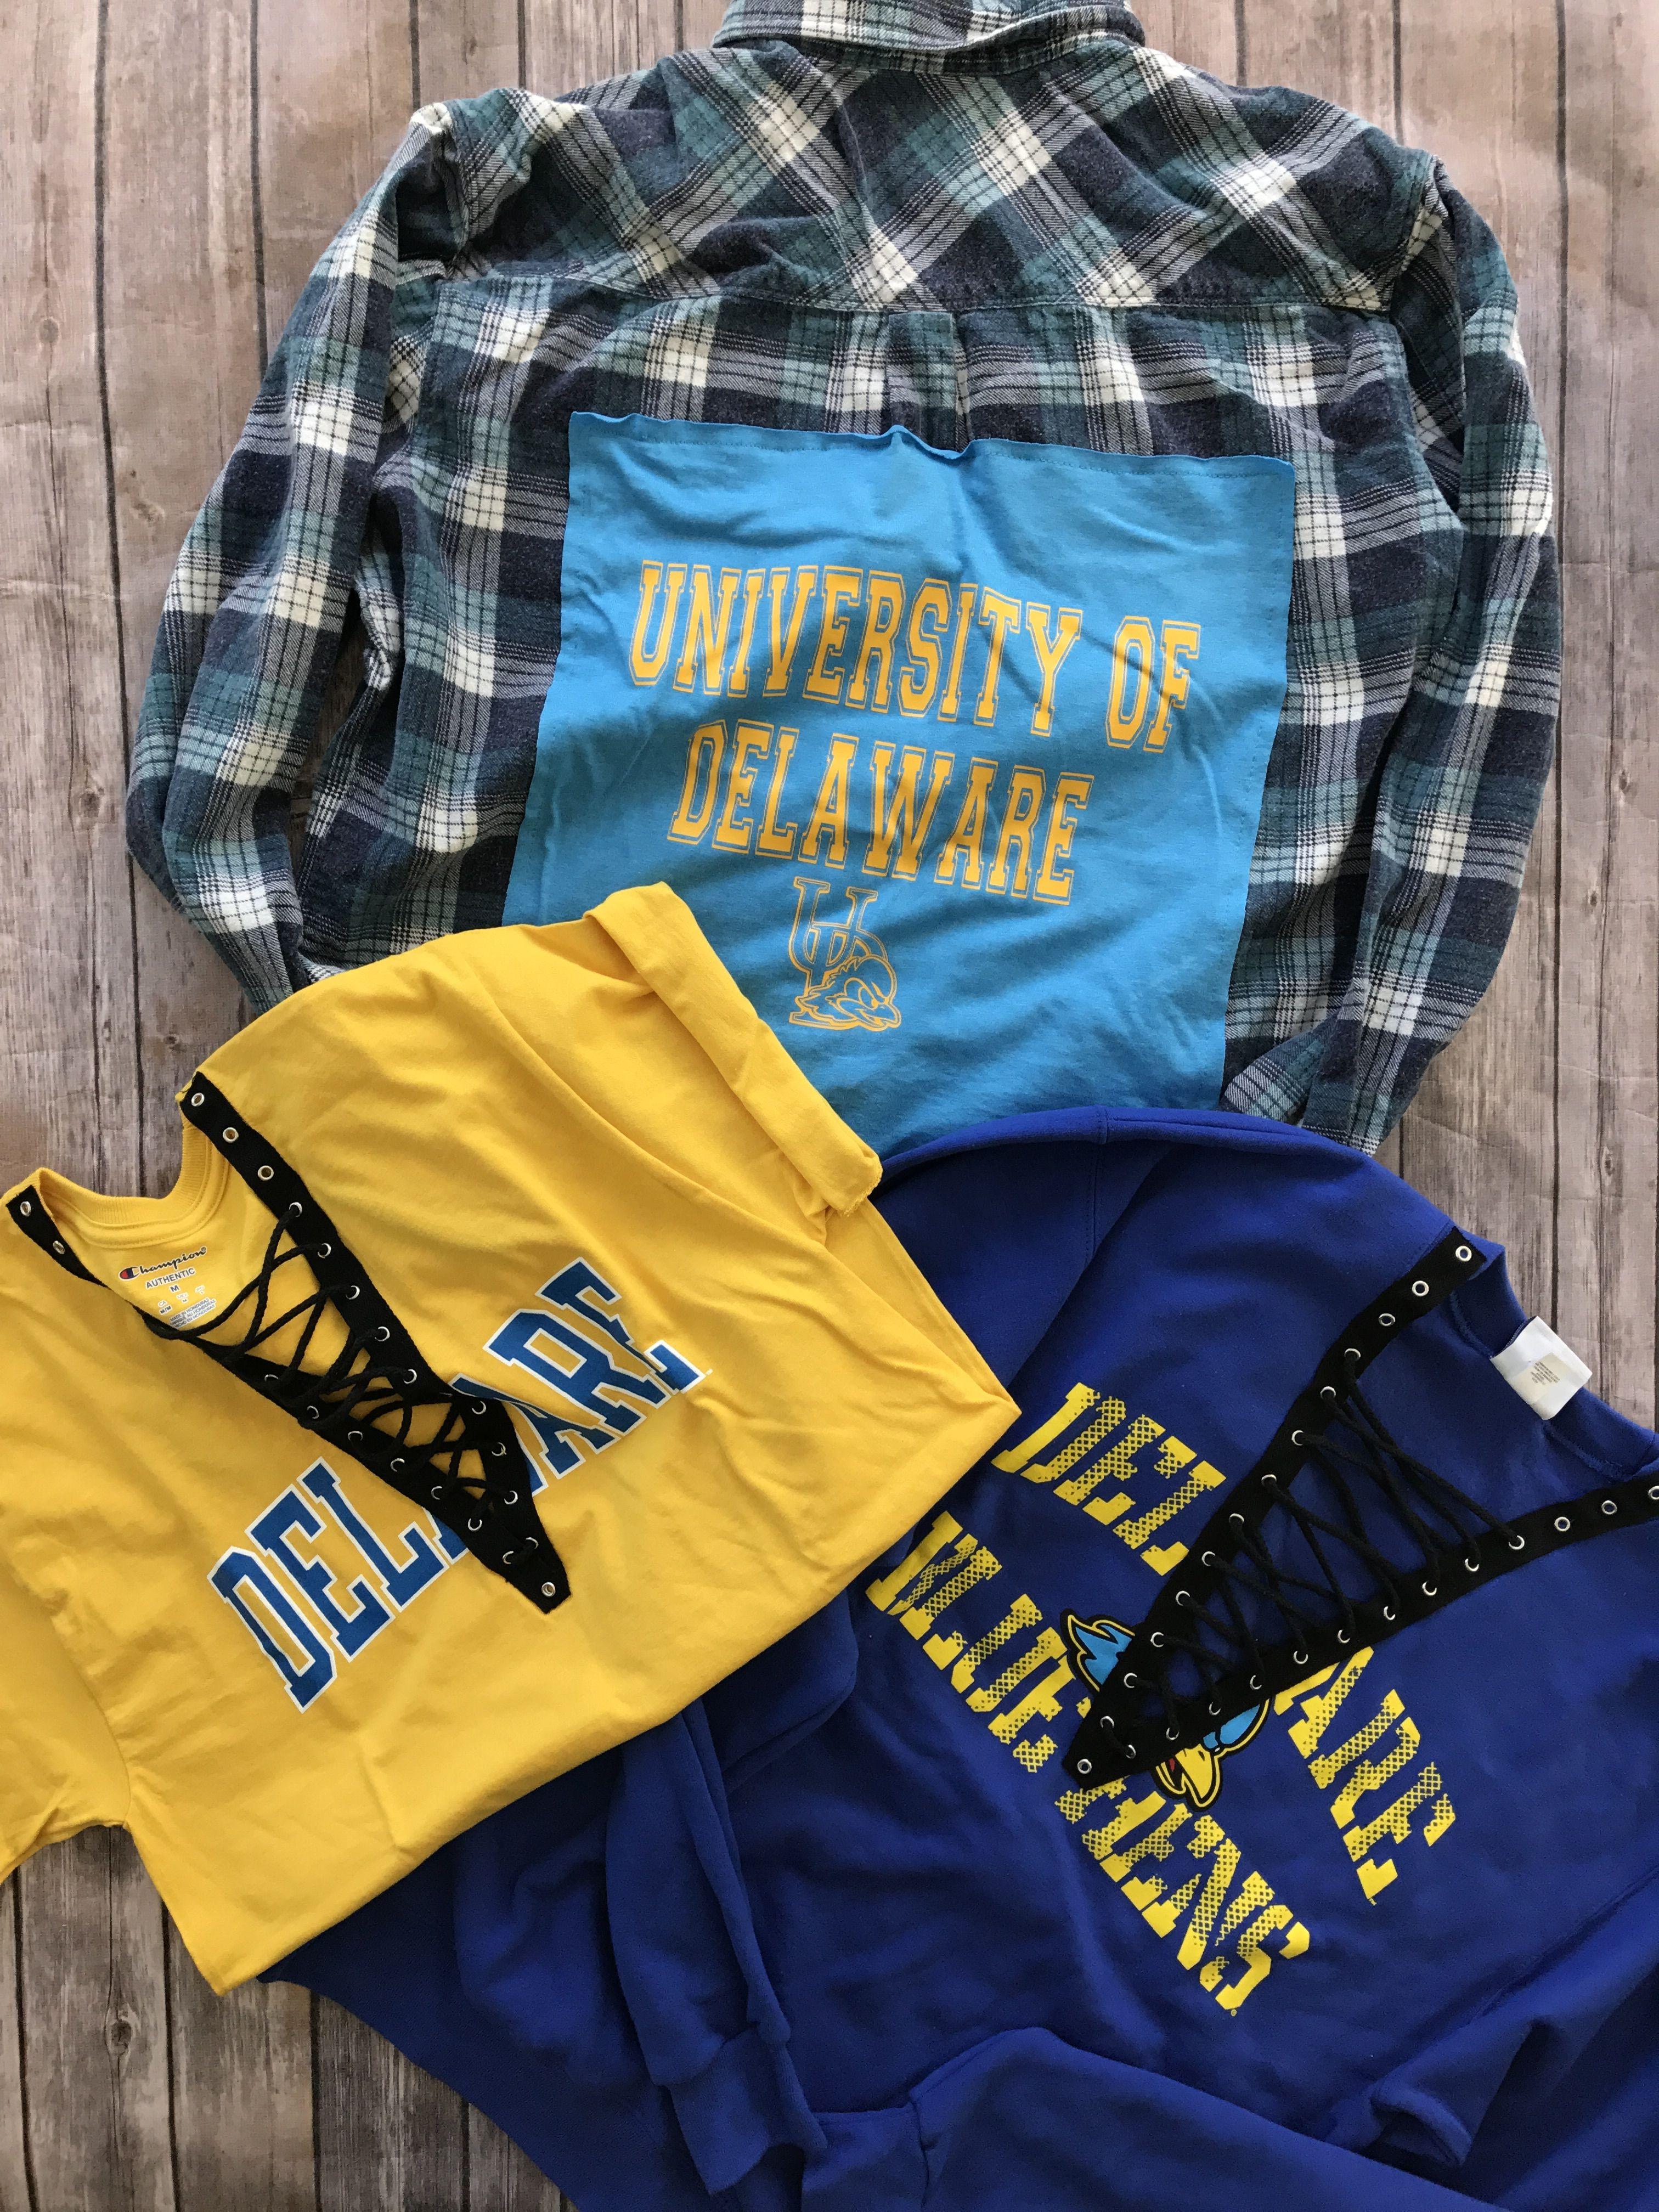 University of Delaware flannel sweatshirt and tee  University of